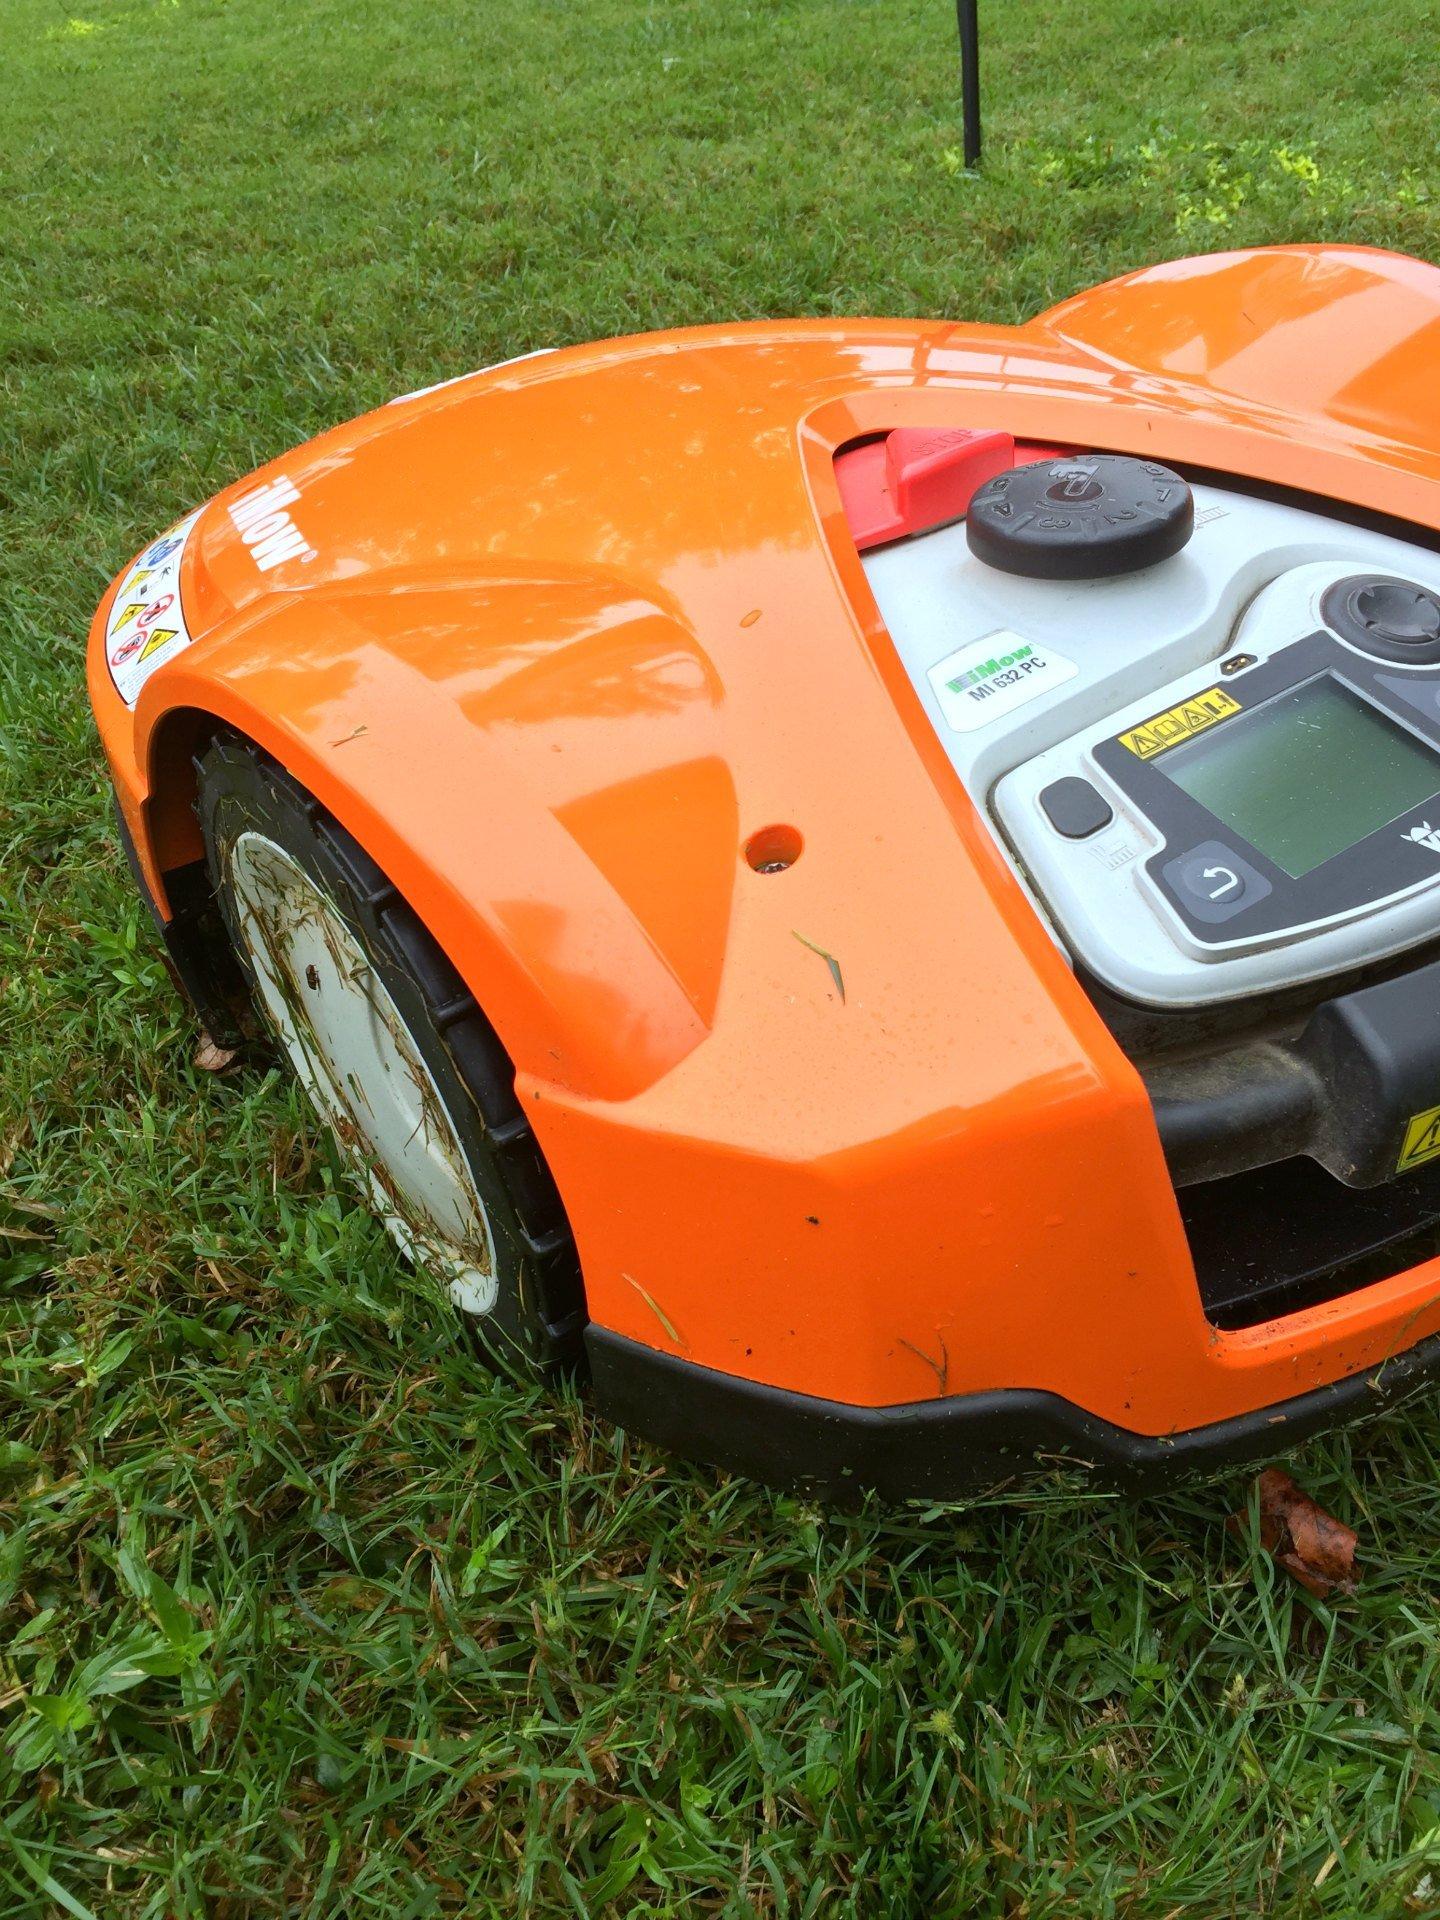 STIHL iMow robotic lawn mower